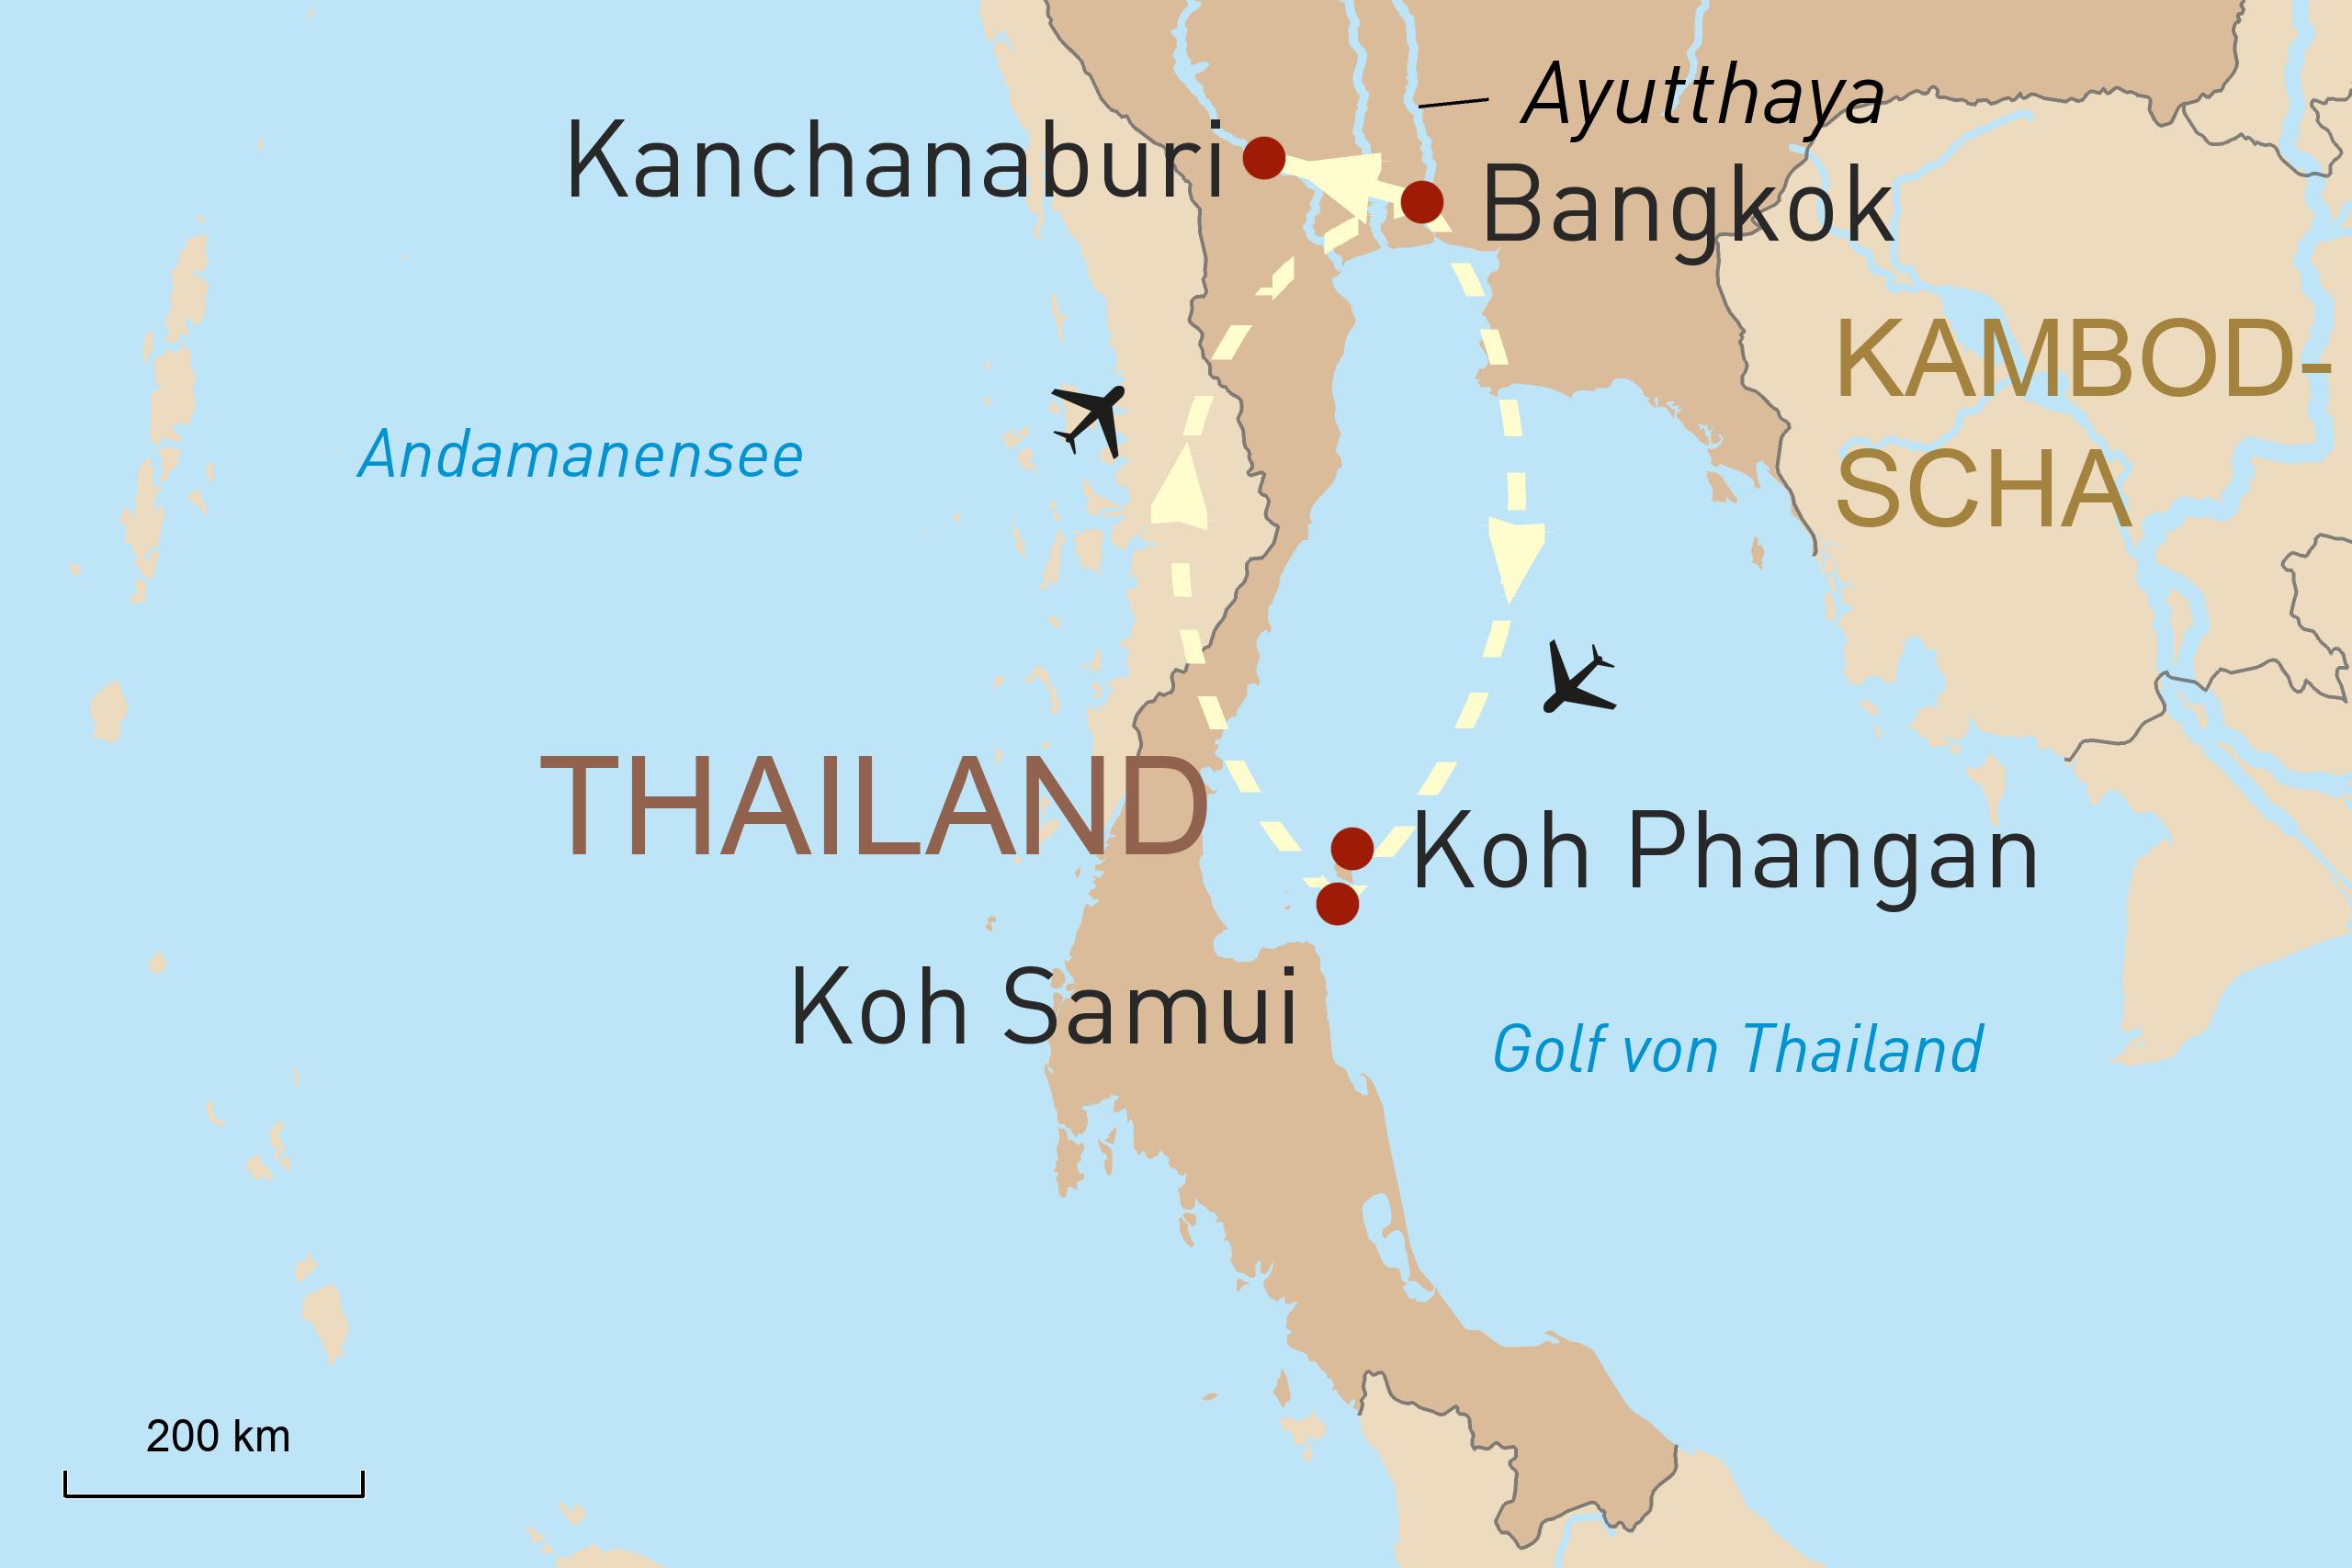 Bangkok, Knachanaburi